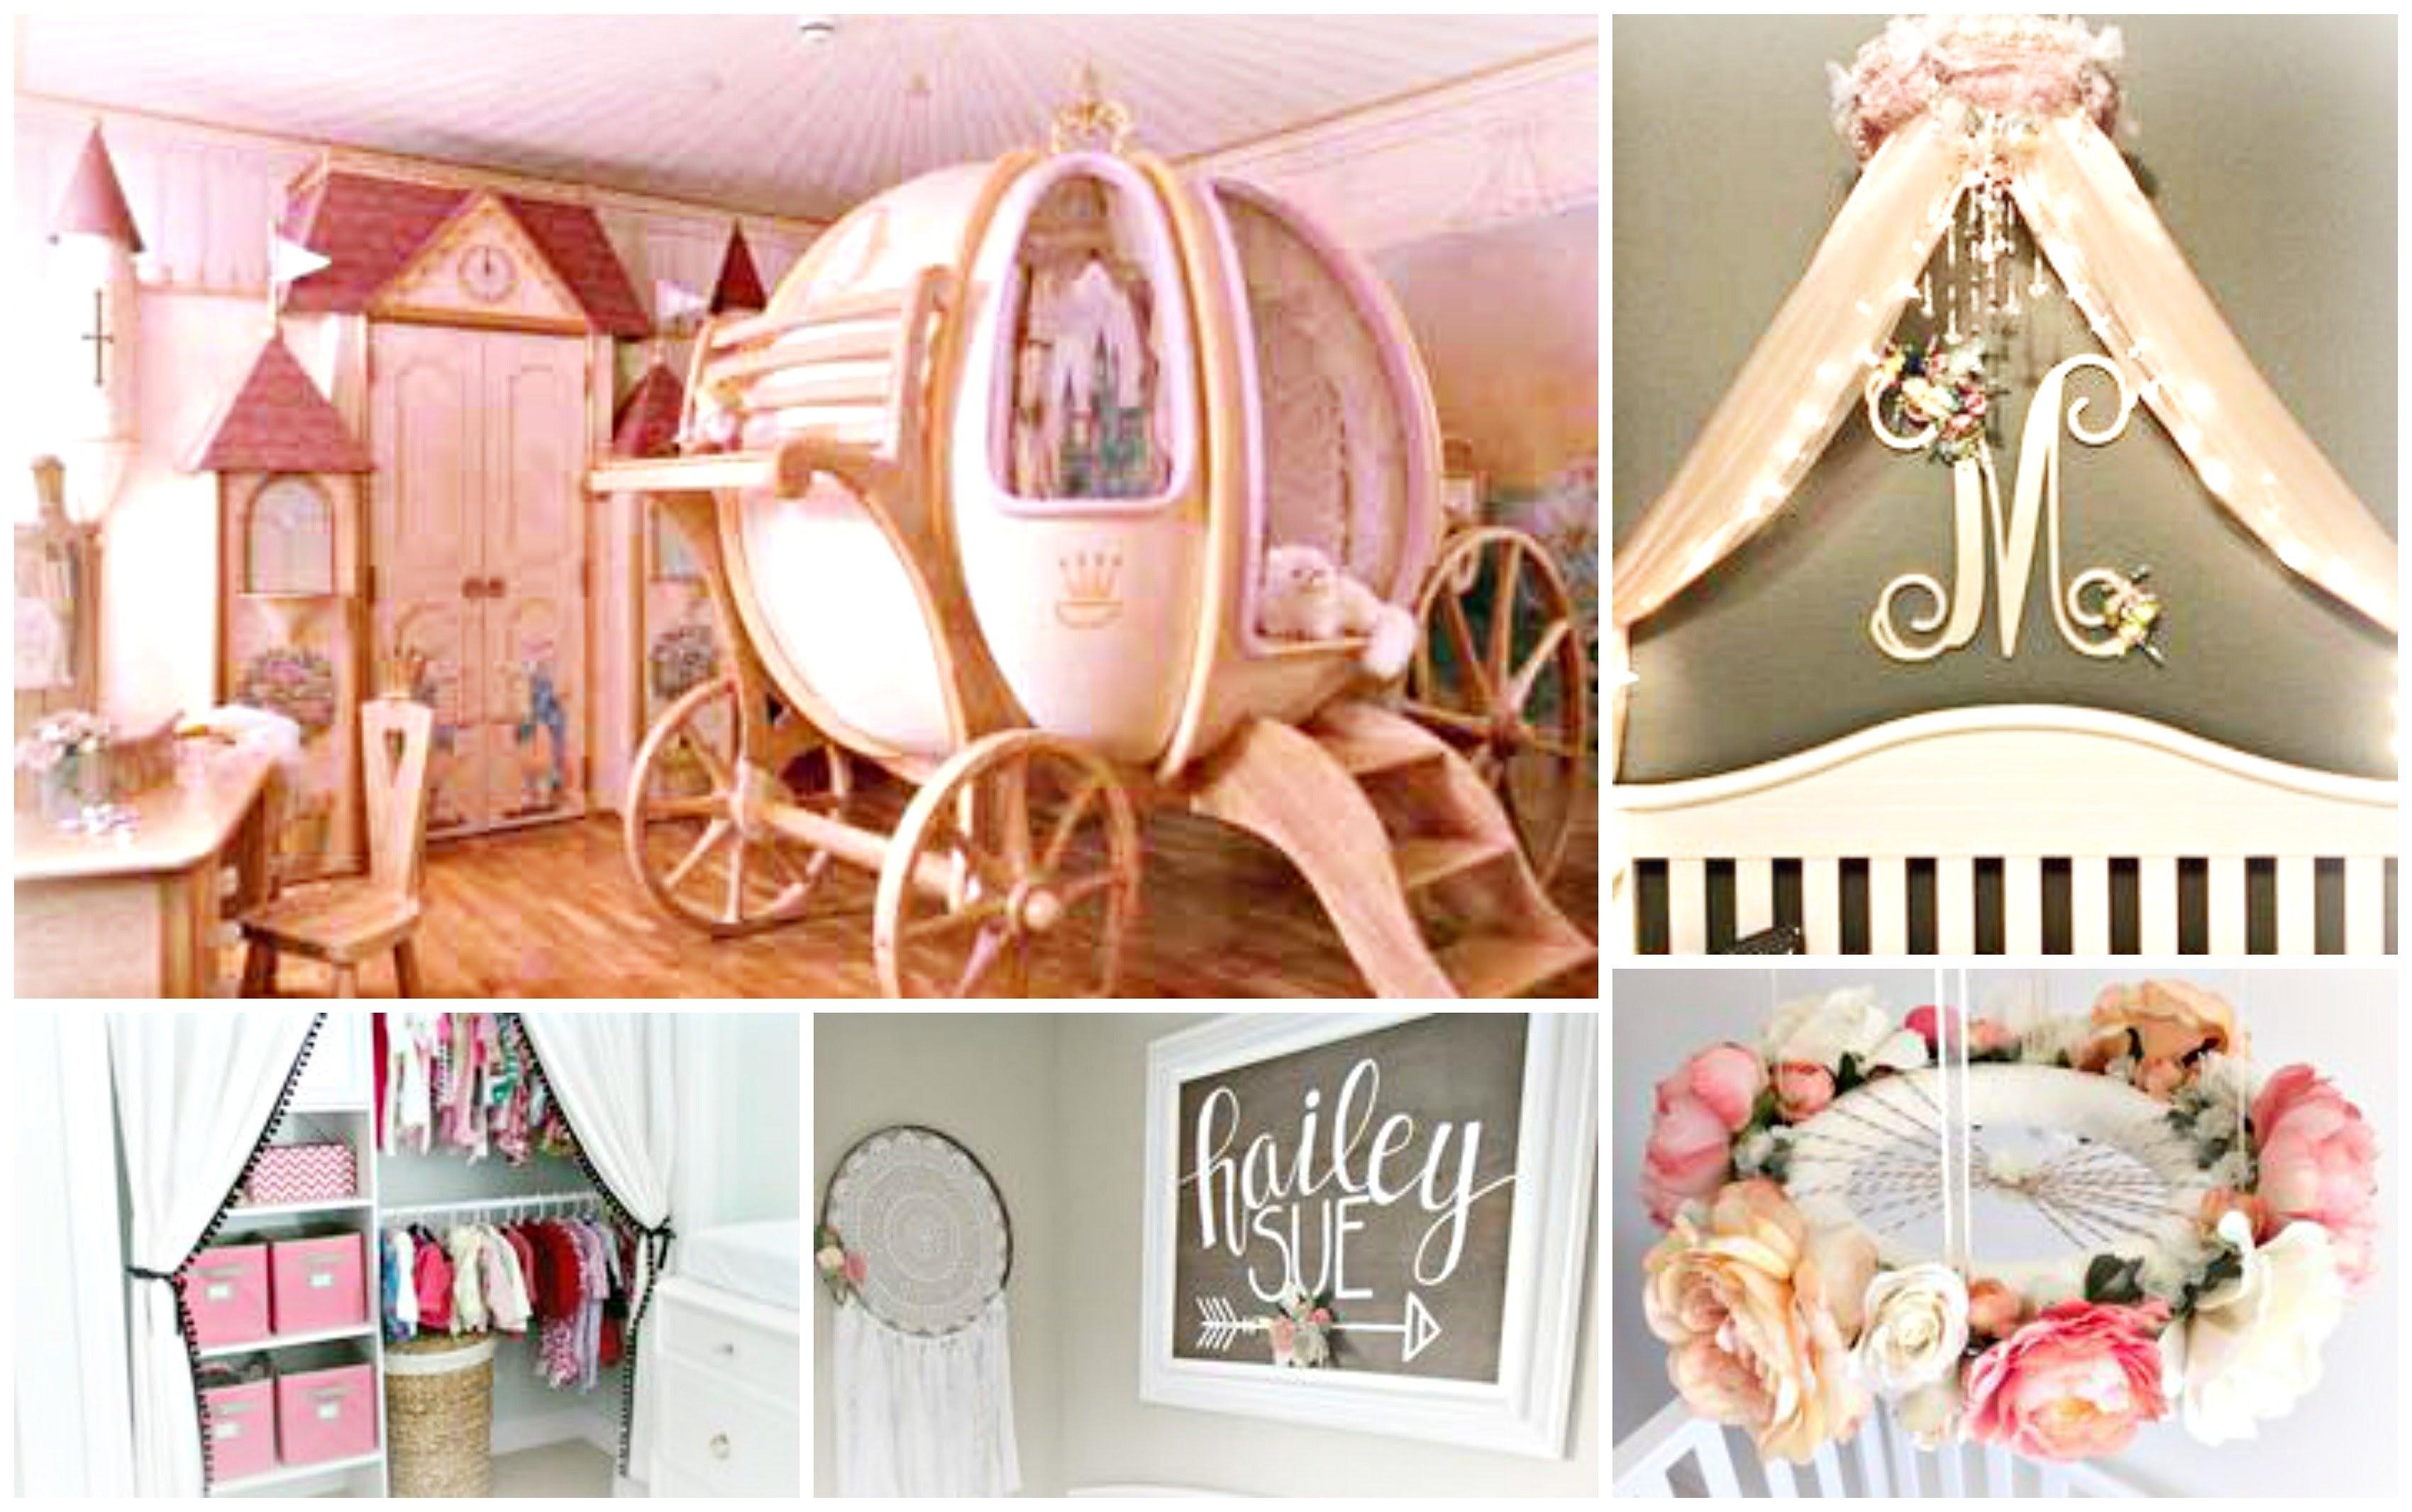 10 Nice Baby Room Ideas For Girls 2017 nursery room ideas for girls baby girl room ideas youtube 2021